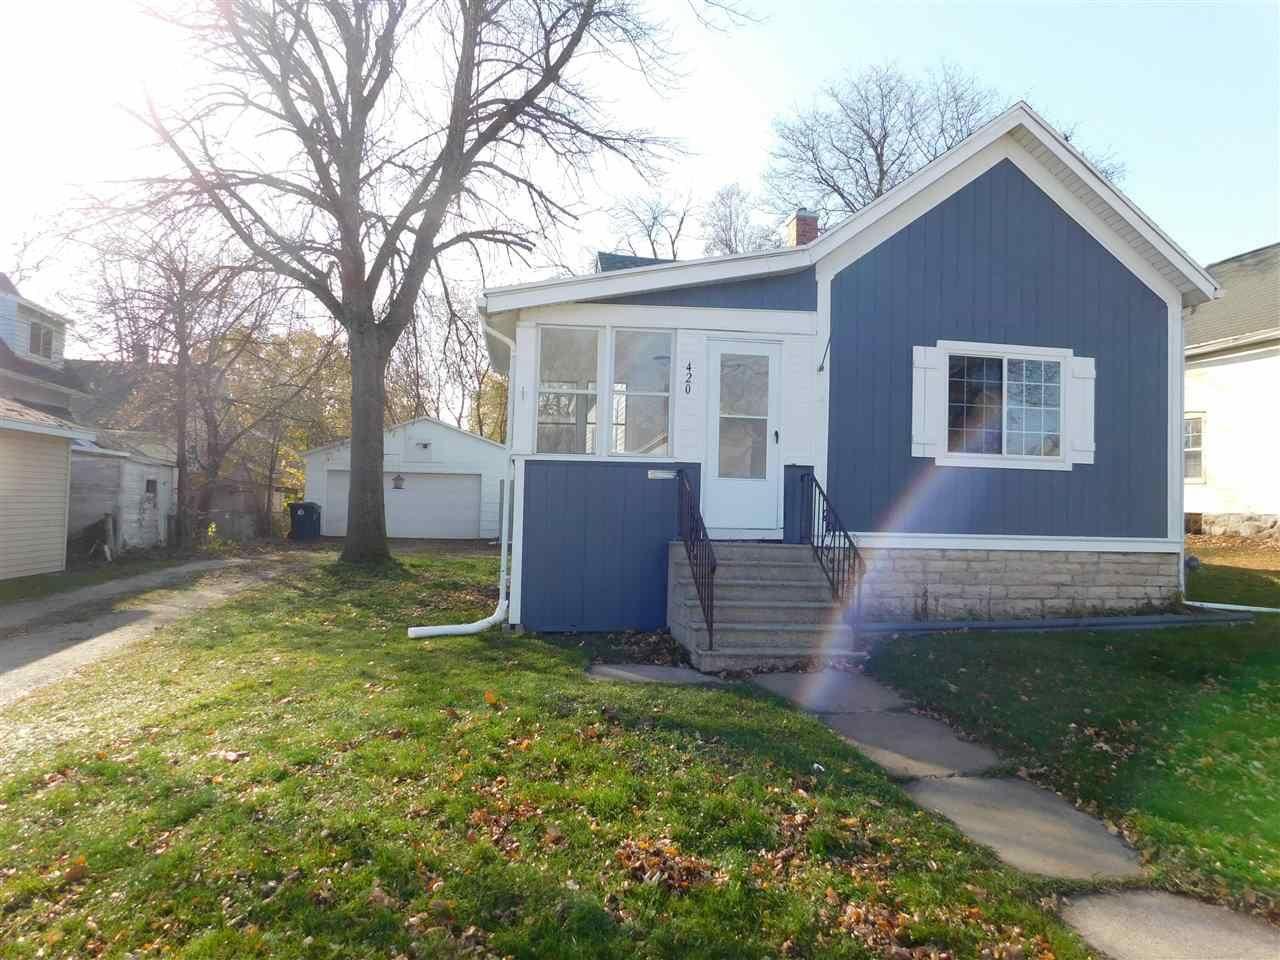 420 W DIVISION STREET, Fond du Lac, WI 54935 - MLS#: 50232237